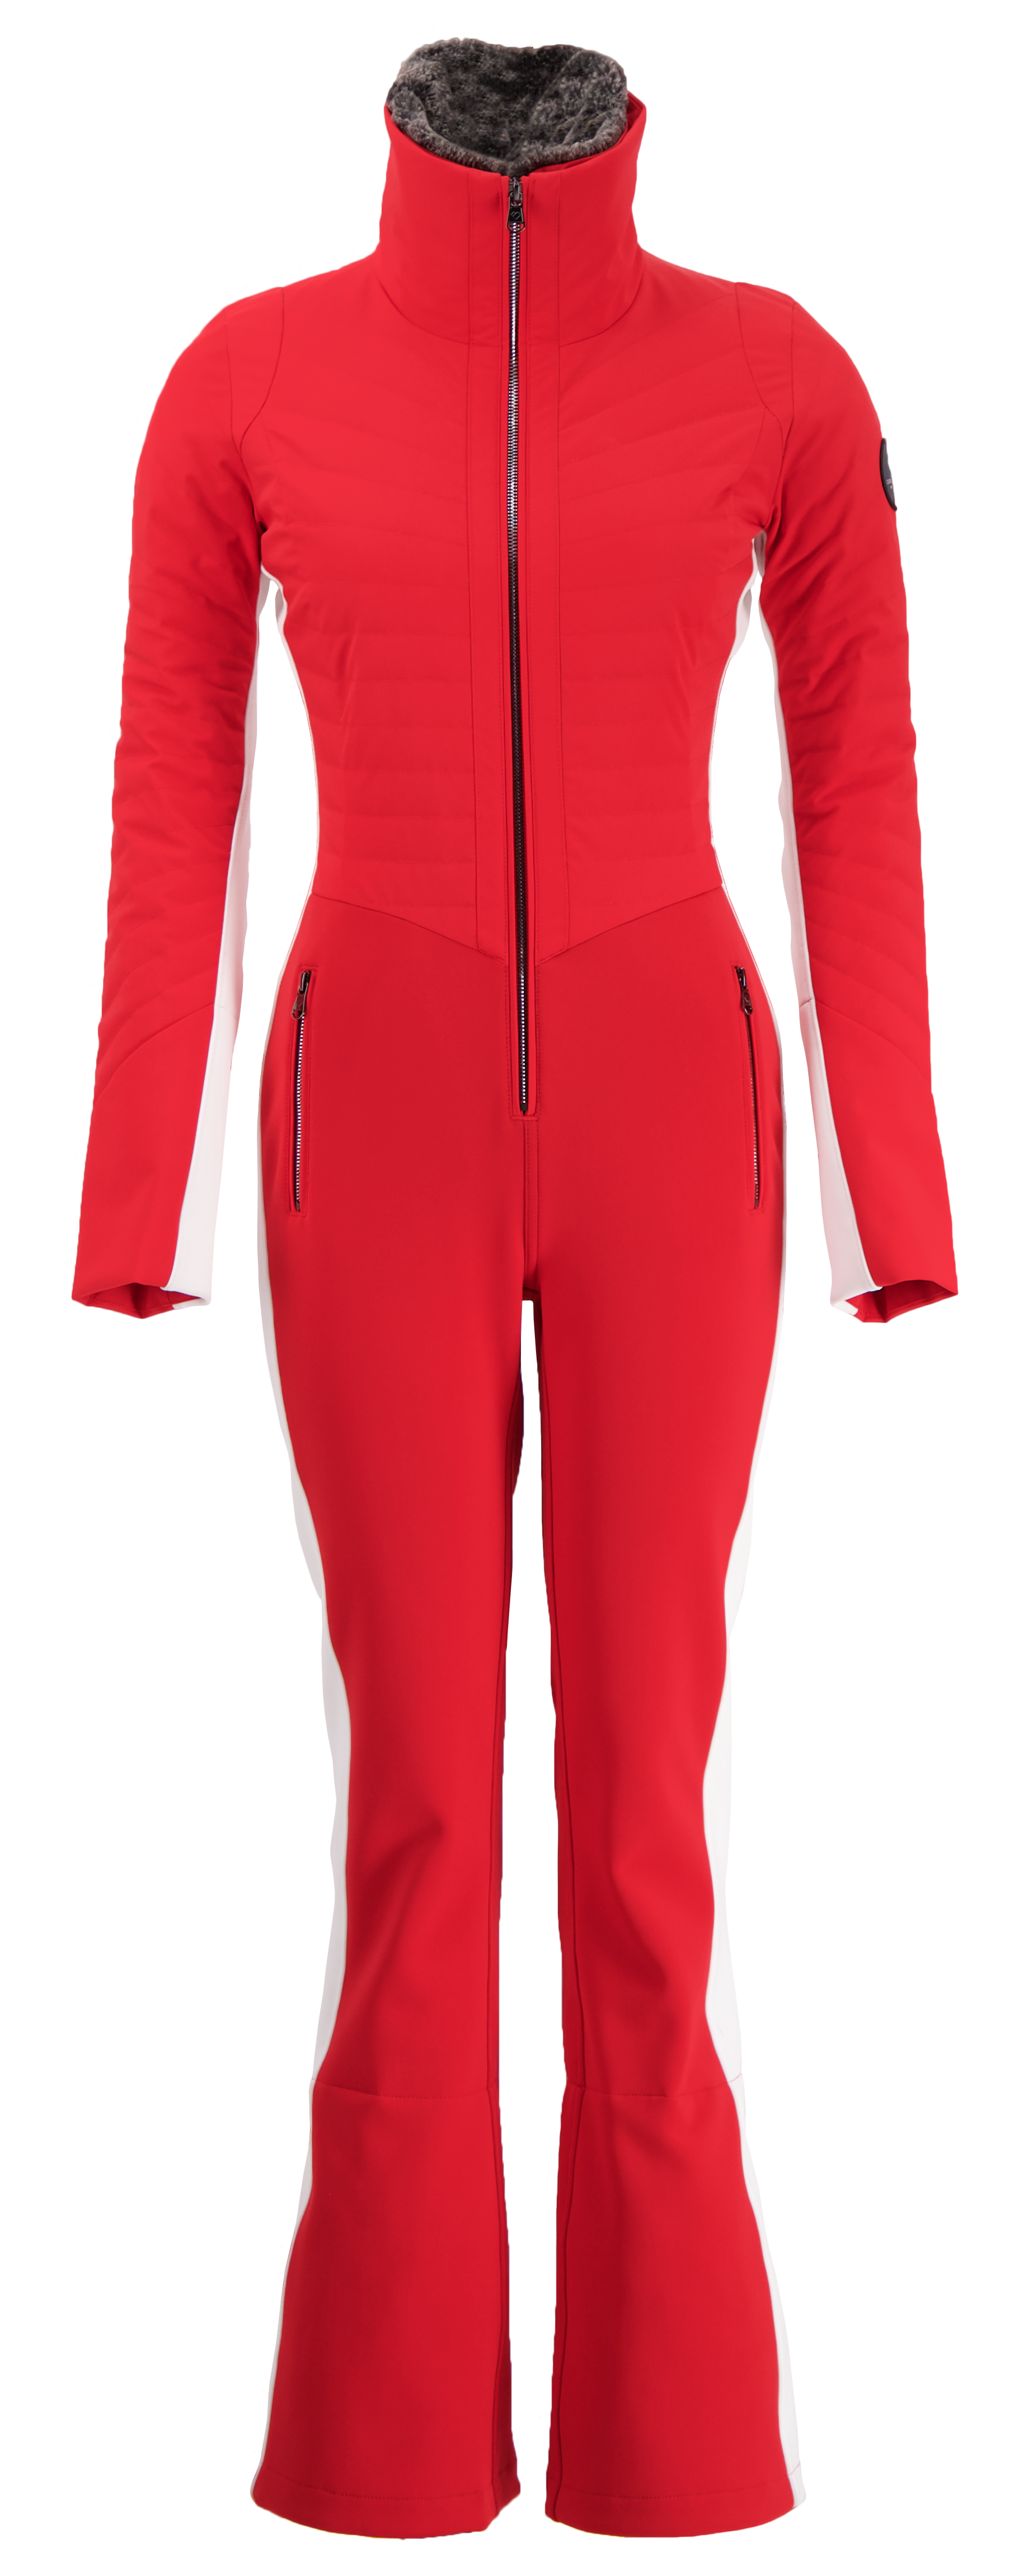 World Cup skier Tina Maze of Slovenia